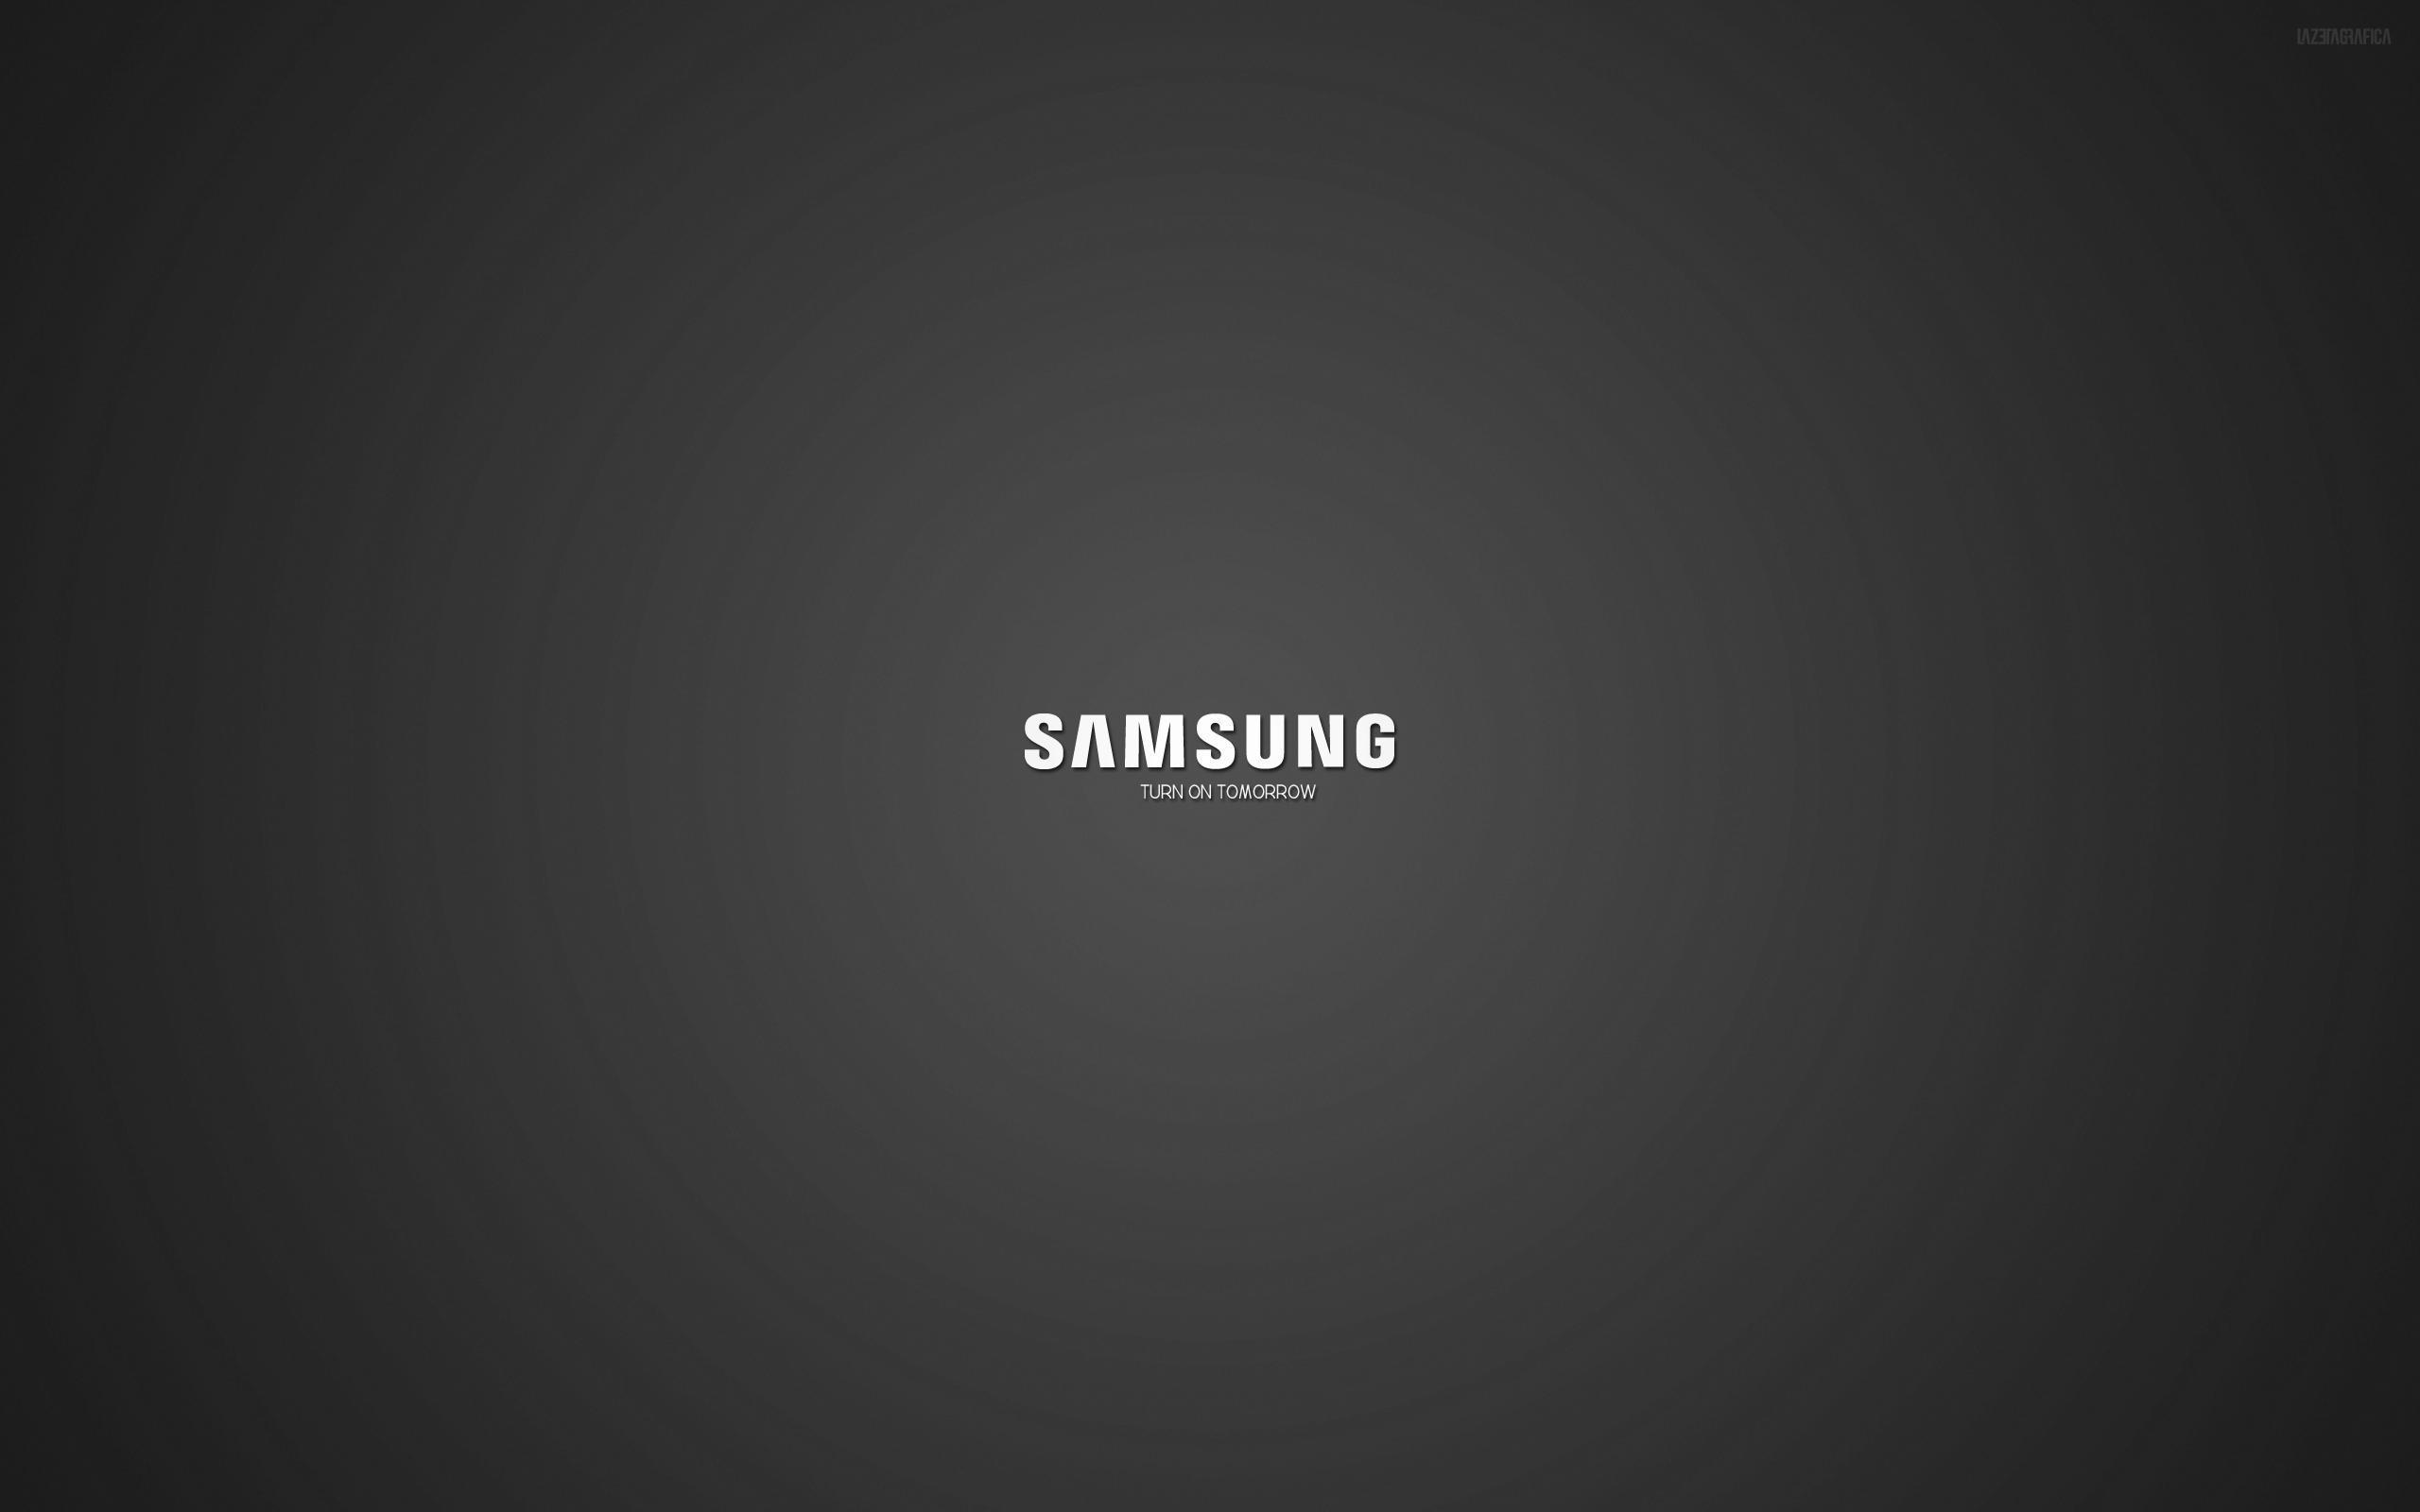 Samsung Galaxy Note 10 Wallpaper For Widescreen Desktop Pc: Samsung Galaxy Logo Wallpapers